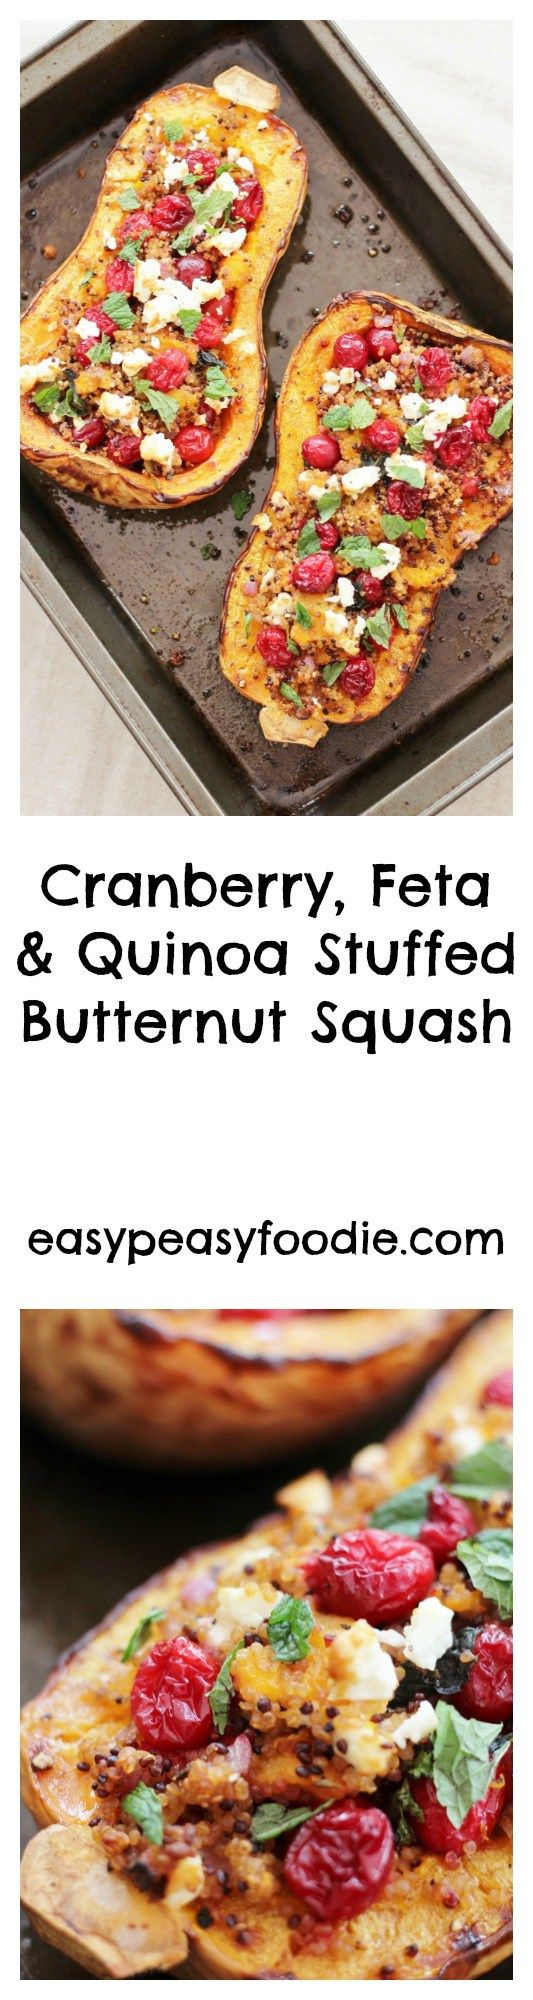 17 best ideas about stuffed butternut squash on pinterest for Vegetarian christmas stuffing